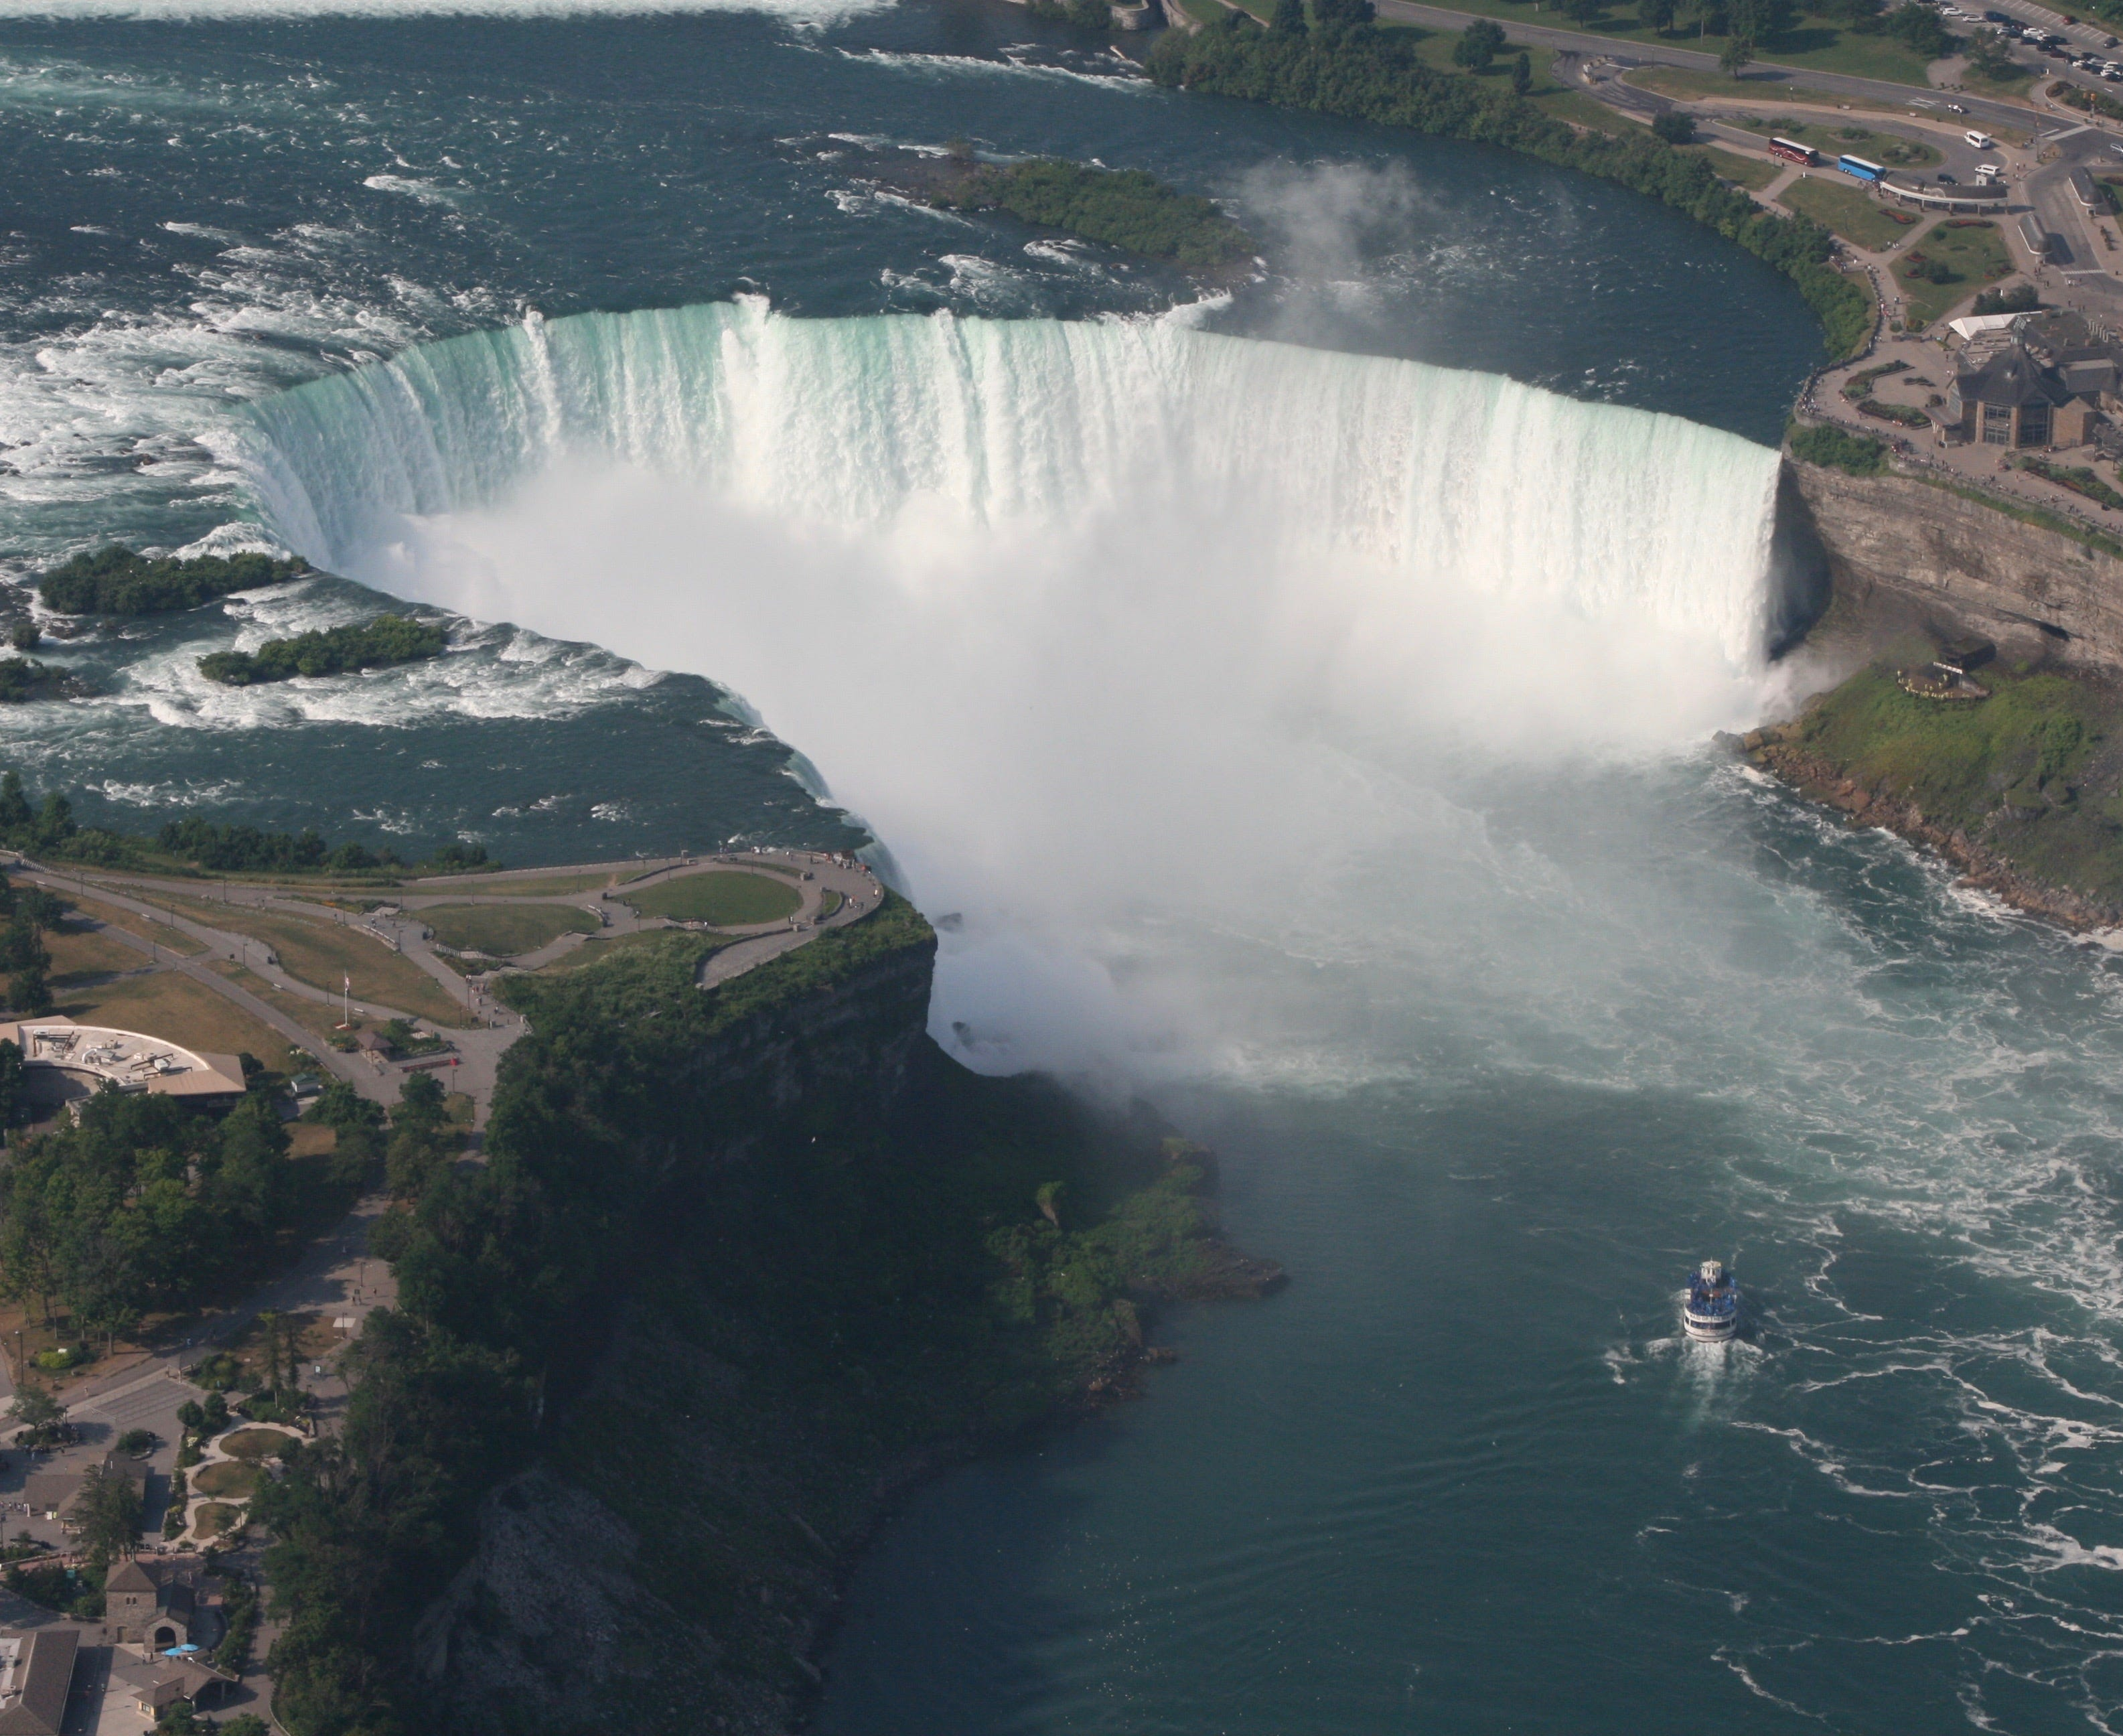 Niagara Falls: Take a photo tour of the iconic park